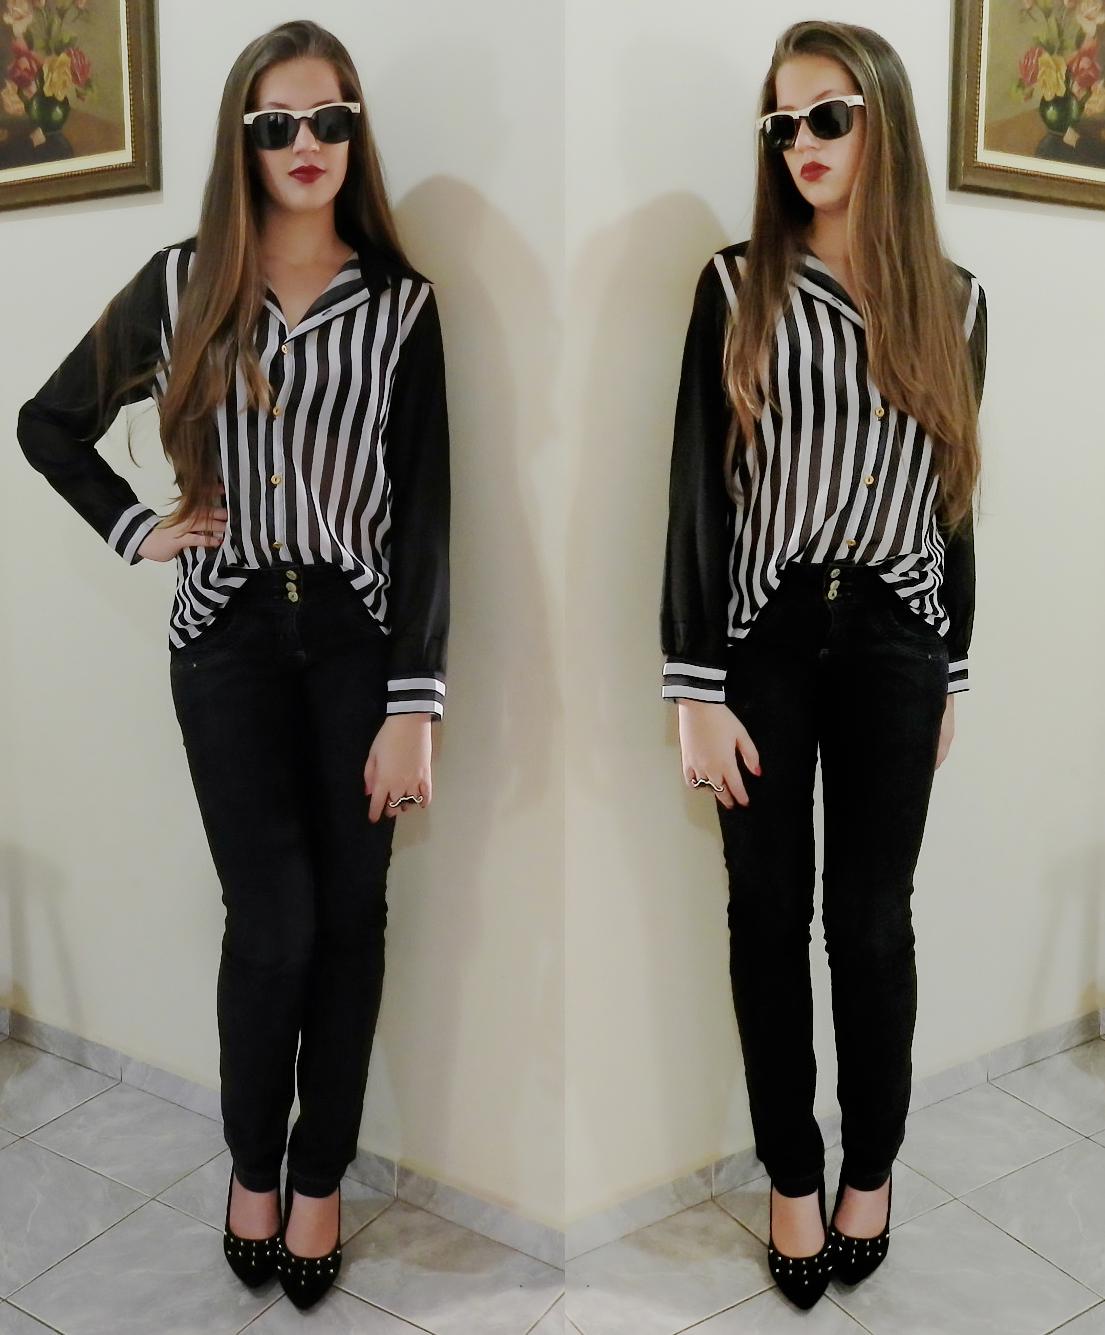 look camisa listrada preto e branco